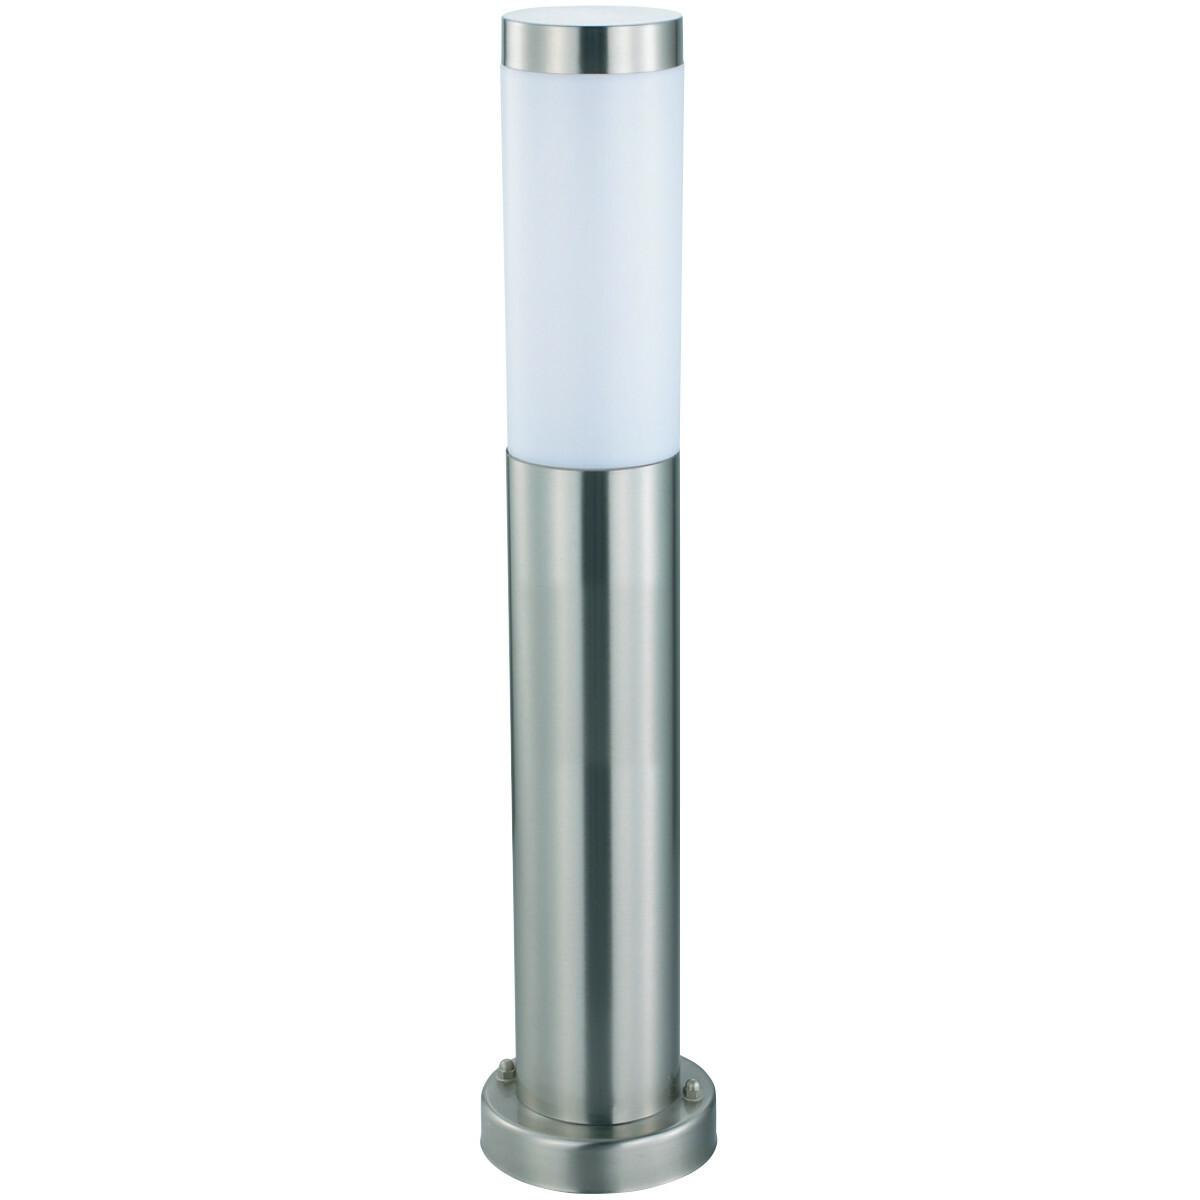 PHILIPS - LED Tuinverlichting - Staande Buitenlamp - CorePro LEDbulb 827 A60 - Laurea 4 - E27 Fittin